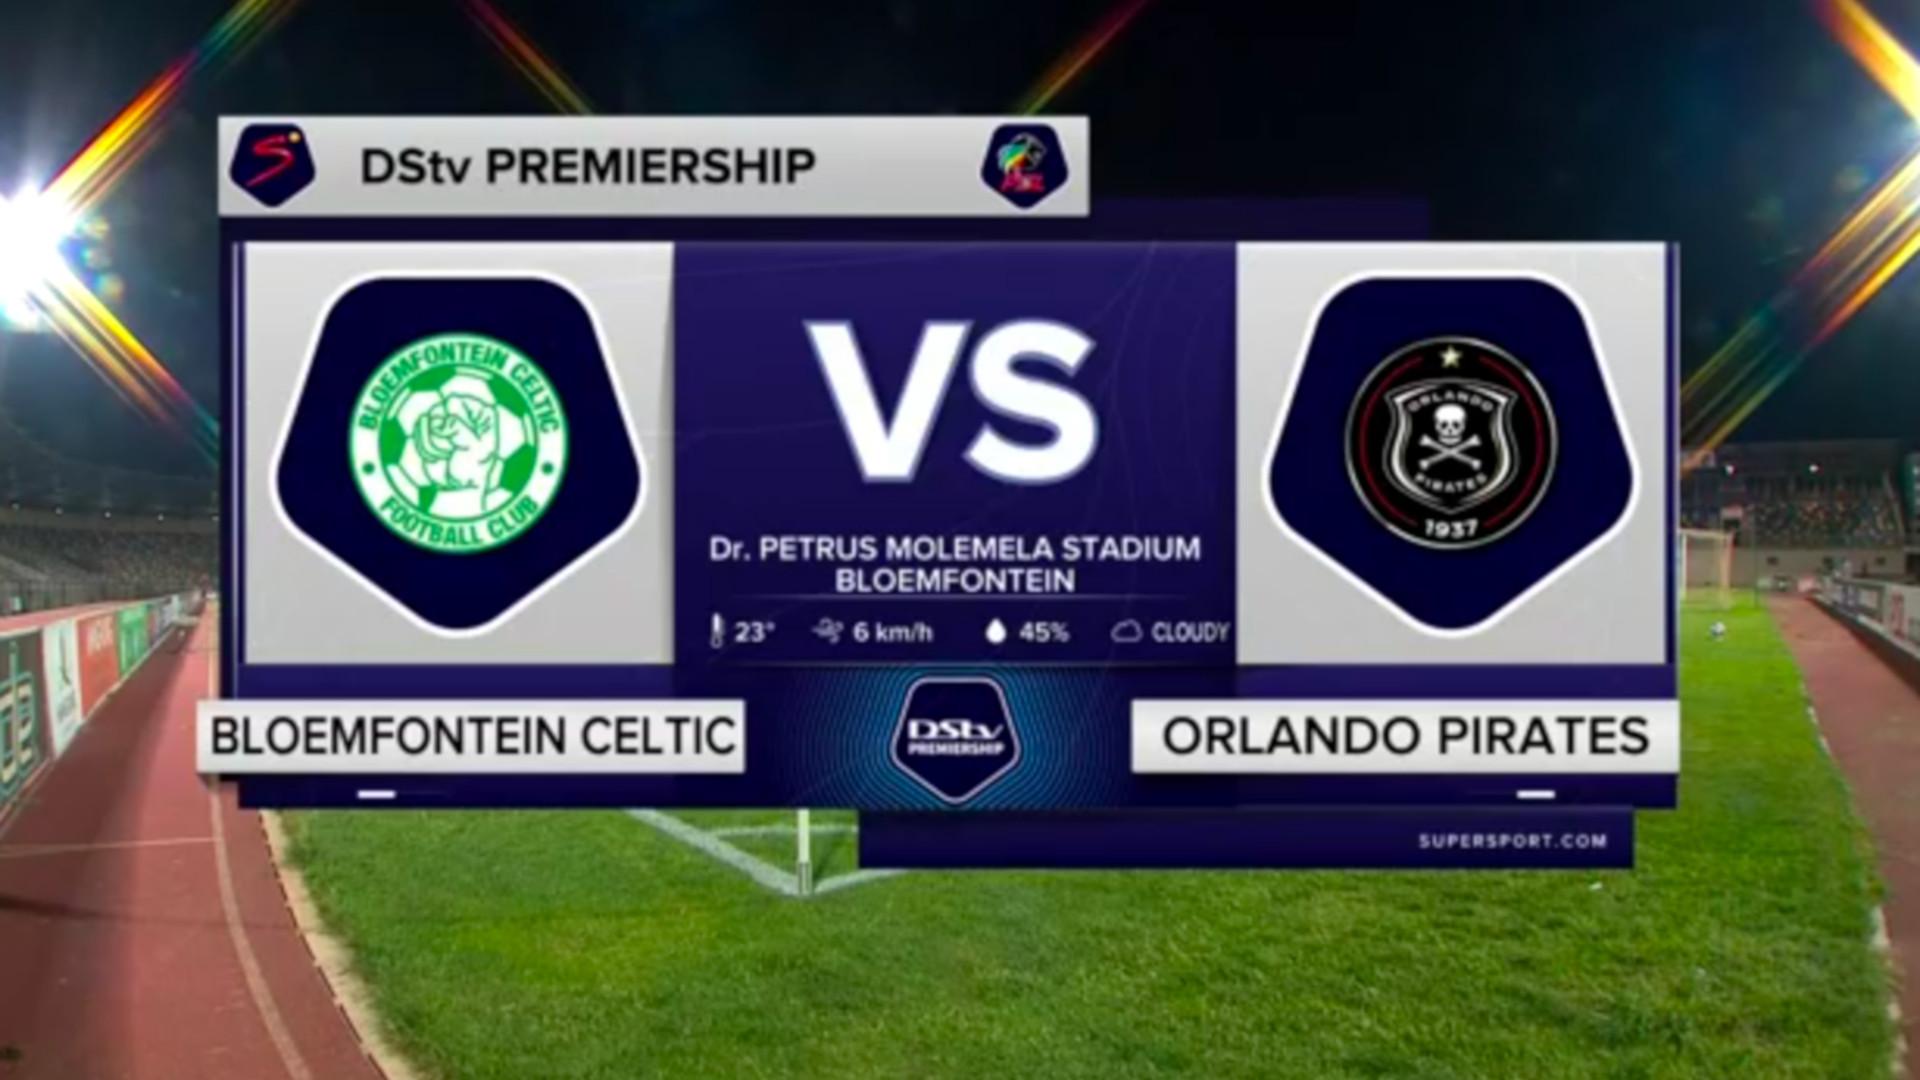 DStv Premiership | Bloemfontein Celtic v Orlando Pirates | Highlights